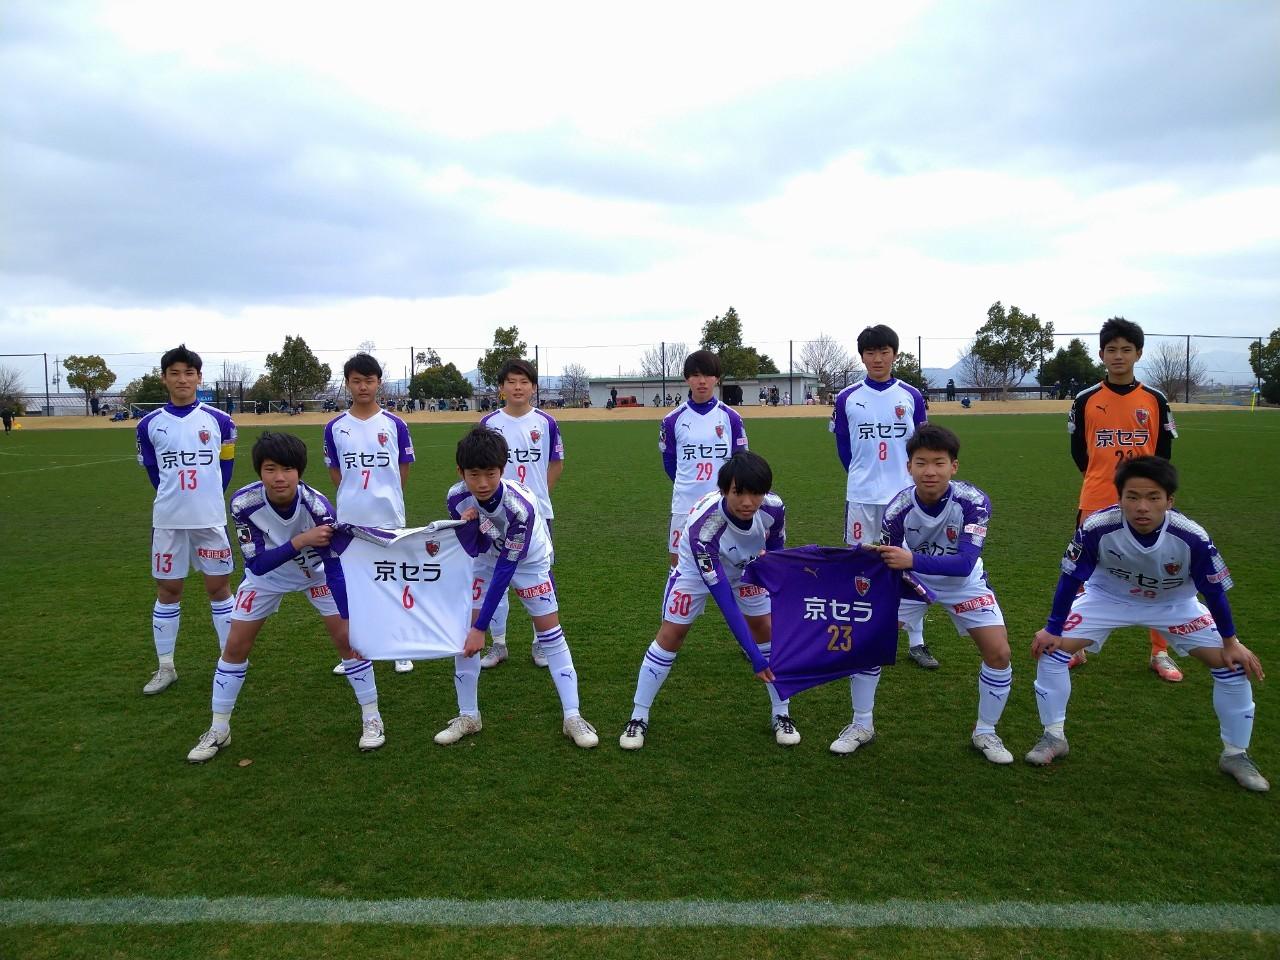 【U-14】高円宮杯JFA U-15サッカーリーグ滋賀2021 TOPリーグ第8節